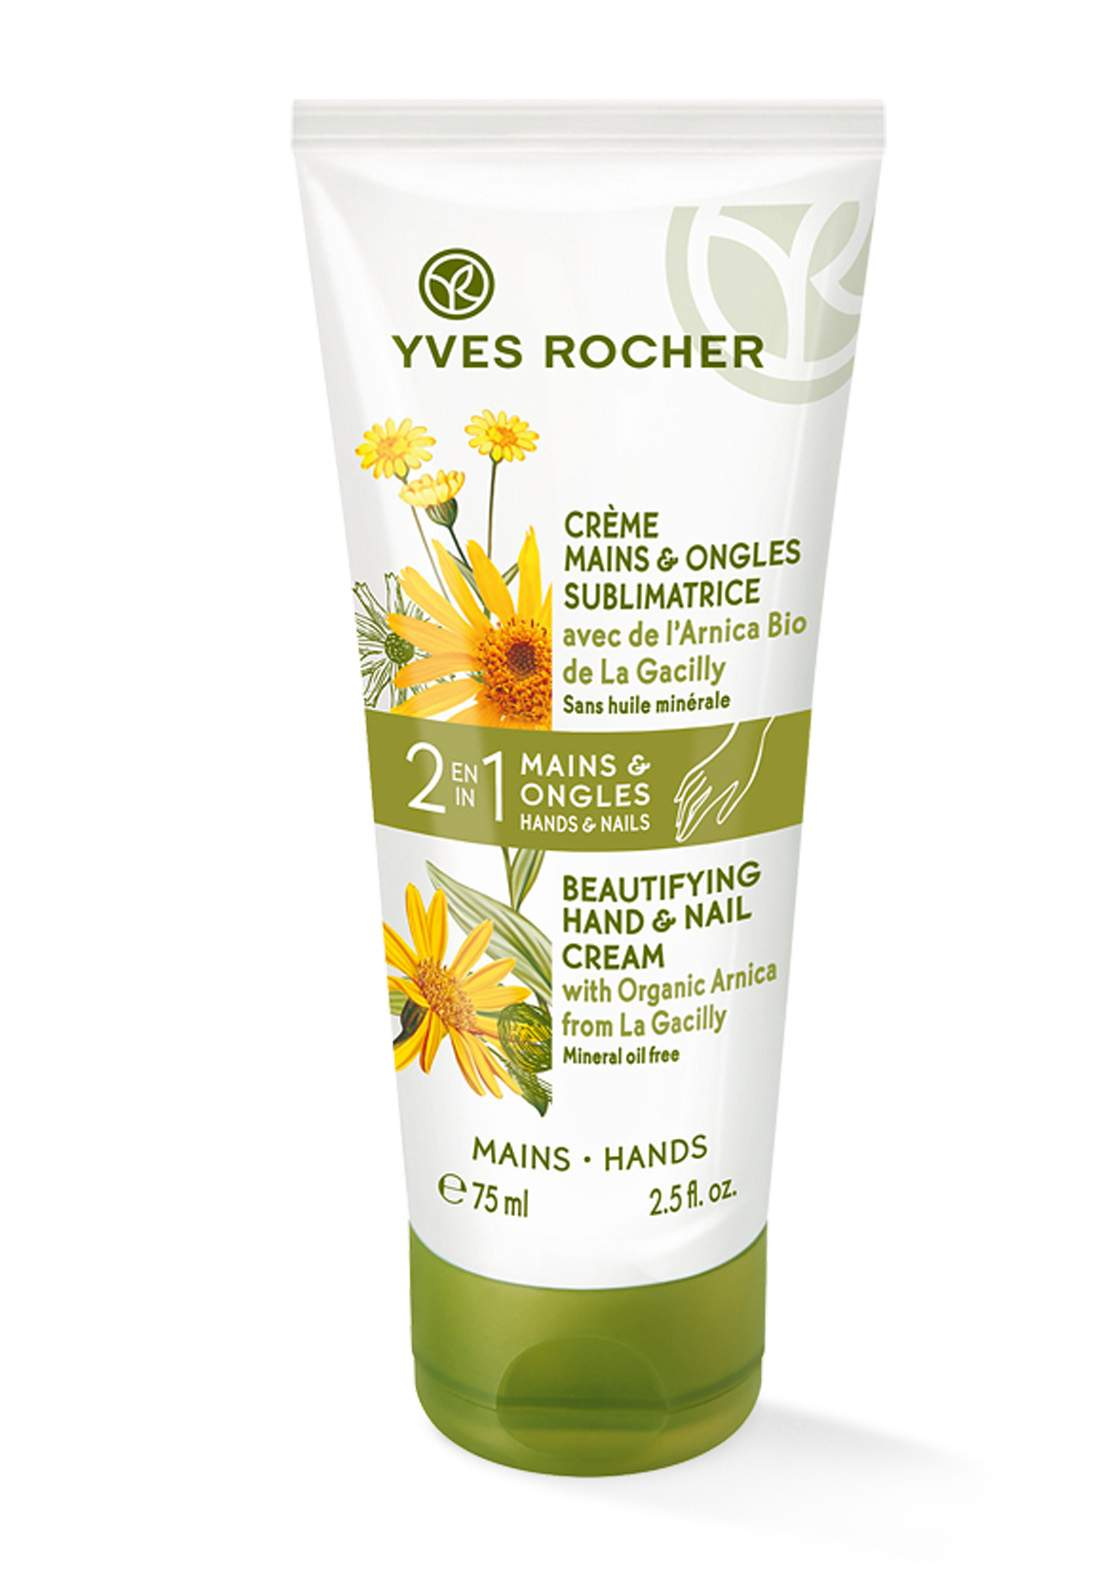 Yves Rocher 55969 2 in 1 Hands and Nails Sublimating Cream 75 ml كريم مرطب لليدين والاظافر